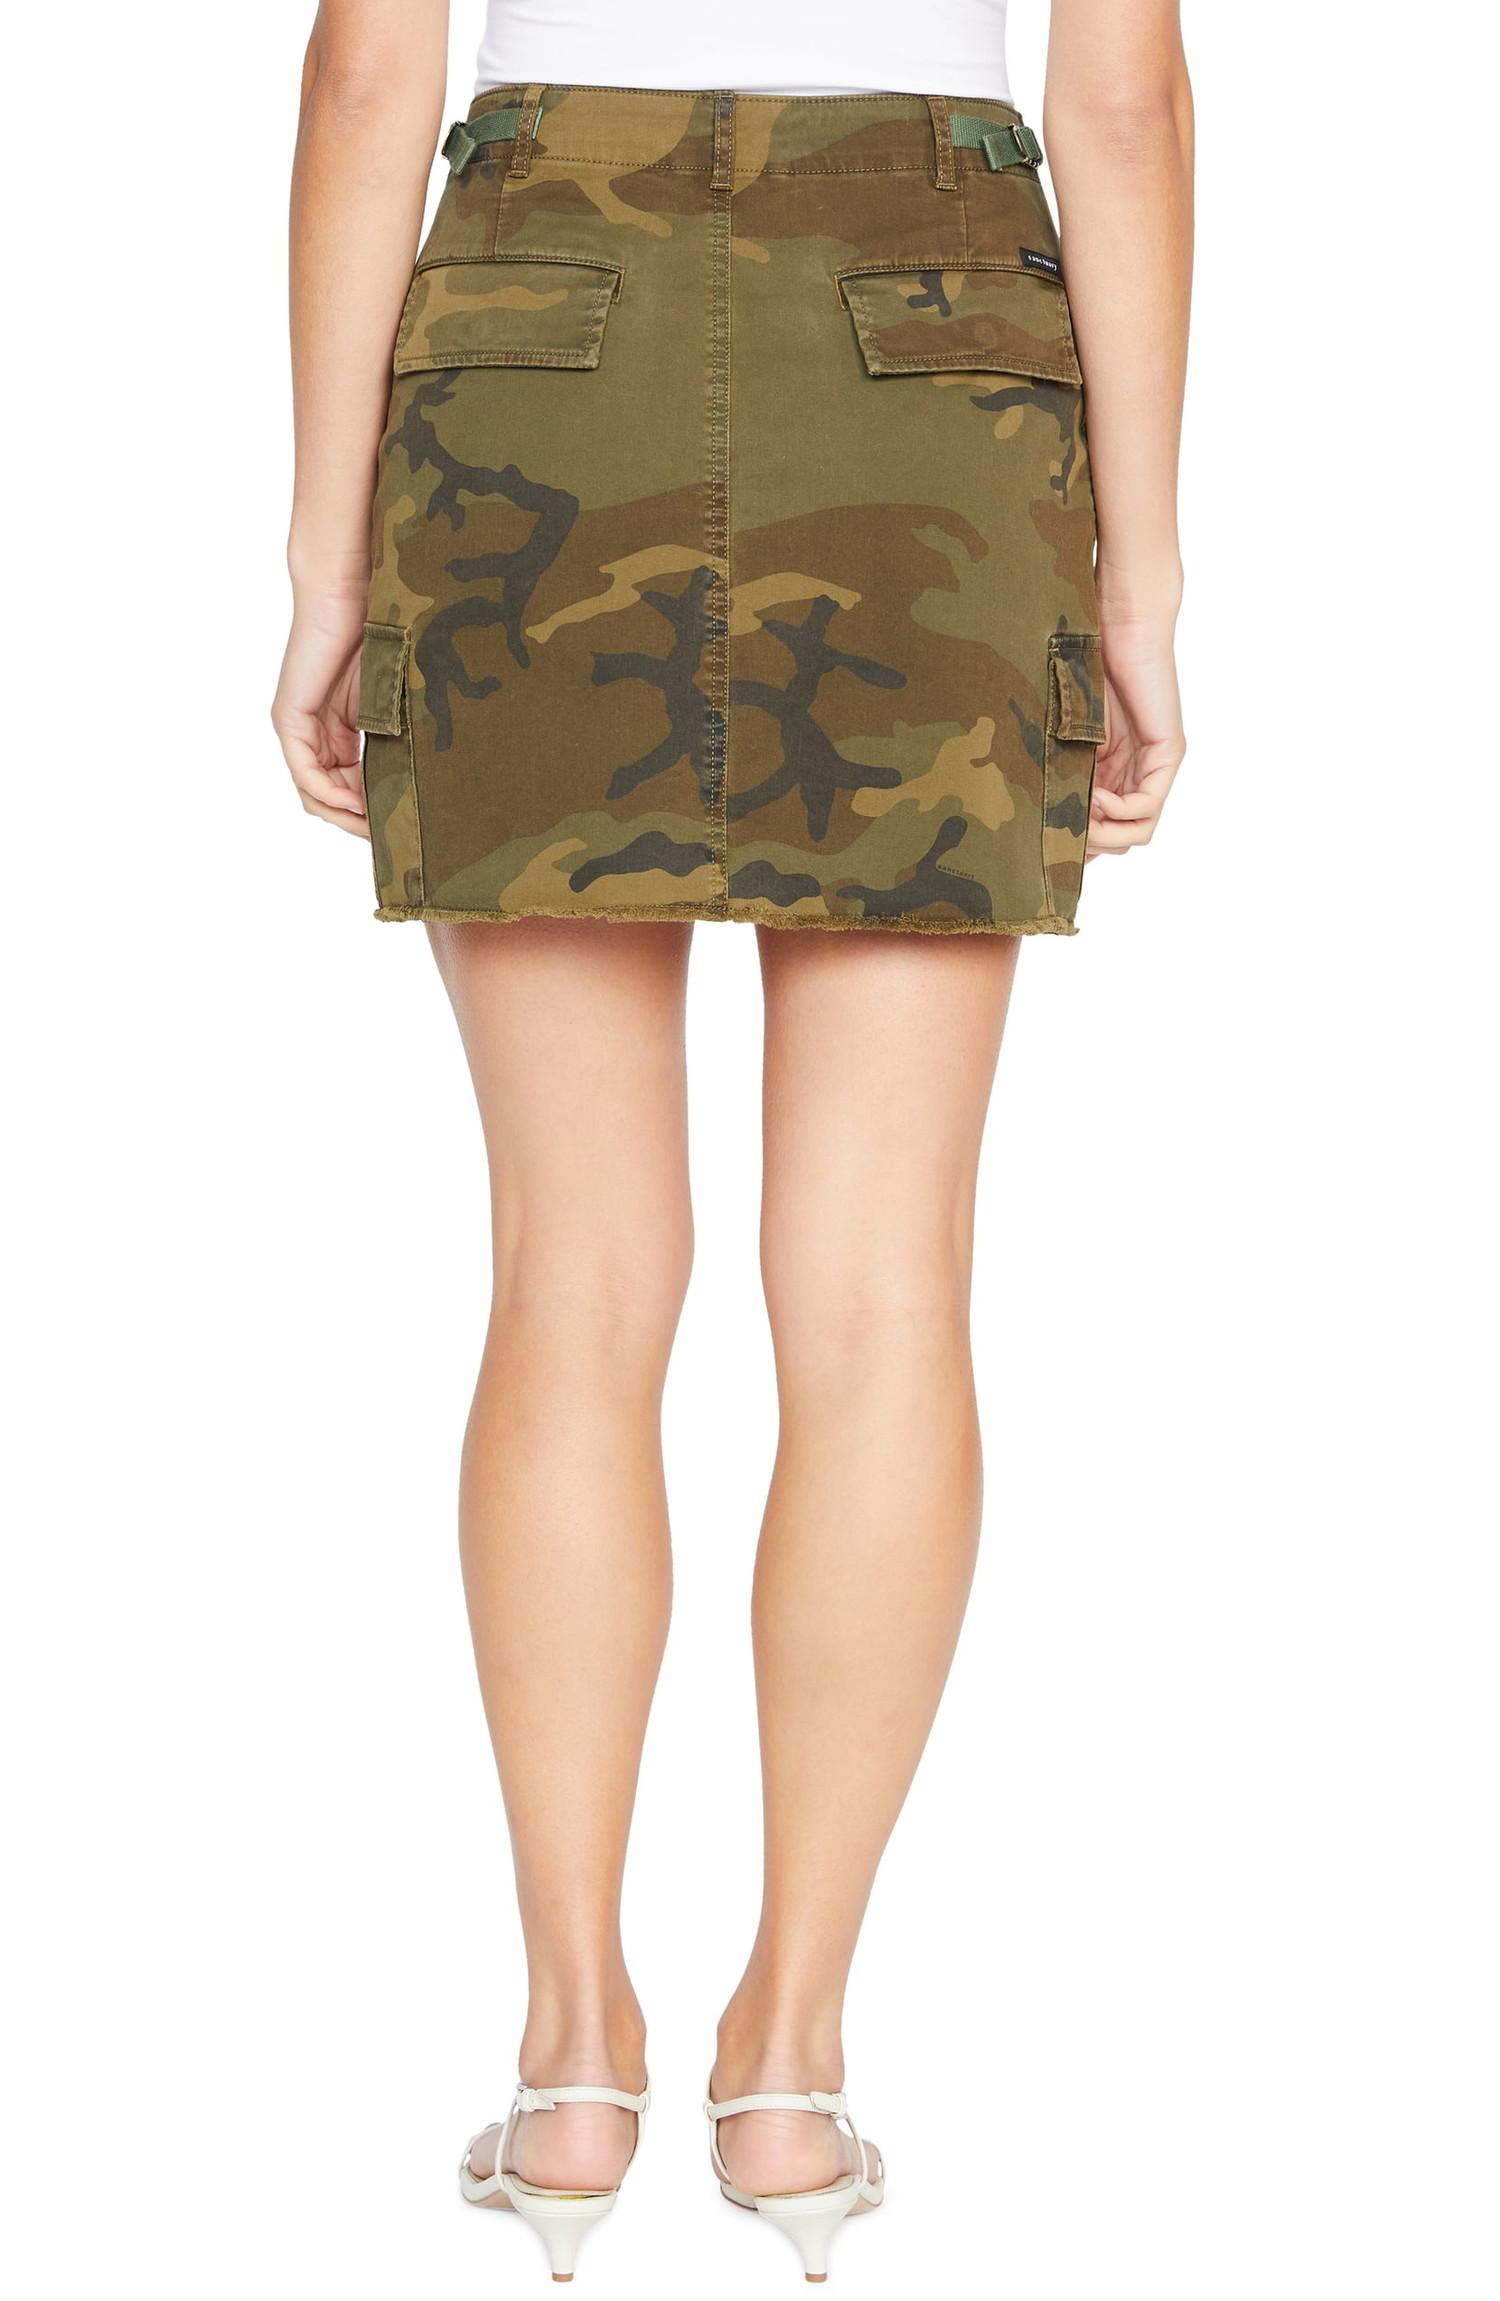 Sanctuary Womens Beige Camoflauge Casual Mini Cargo Skirt 28 BHFO 7197